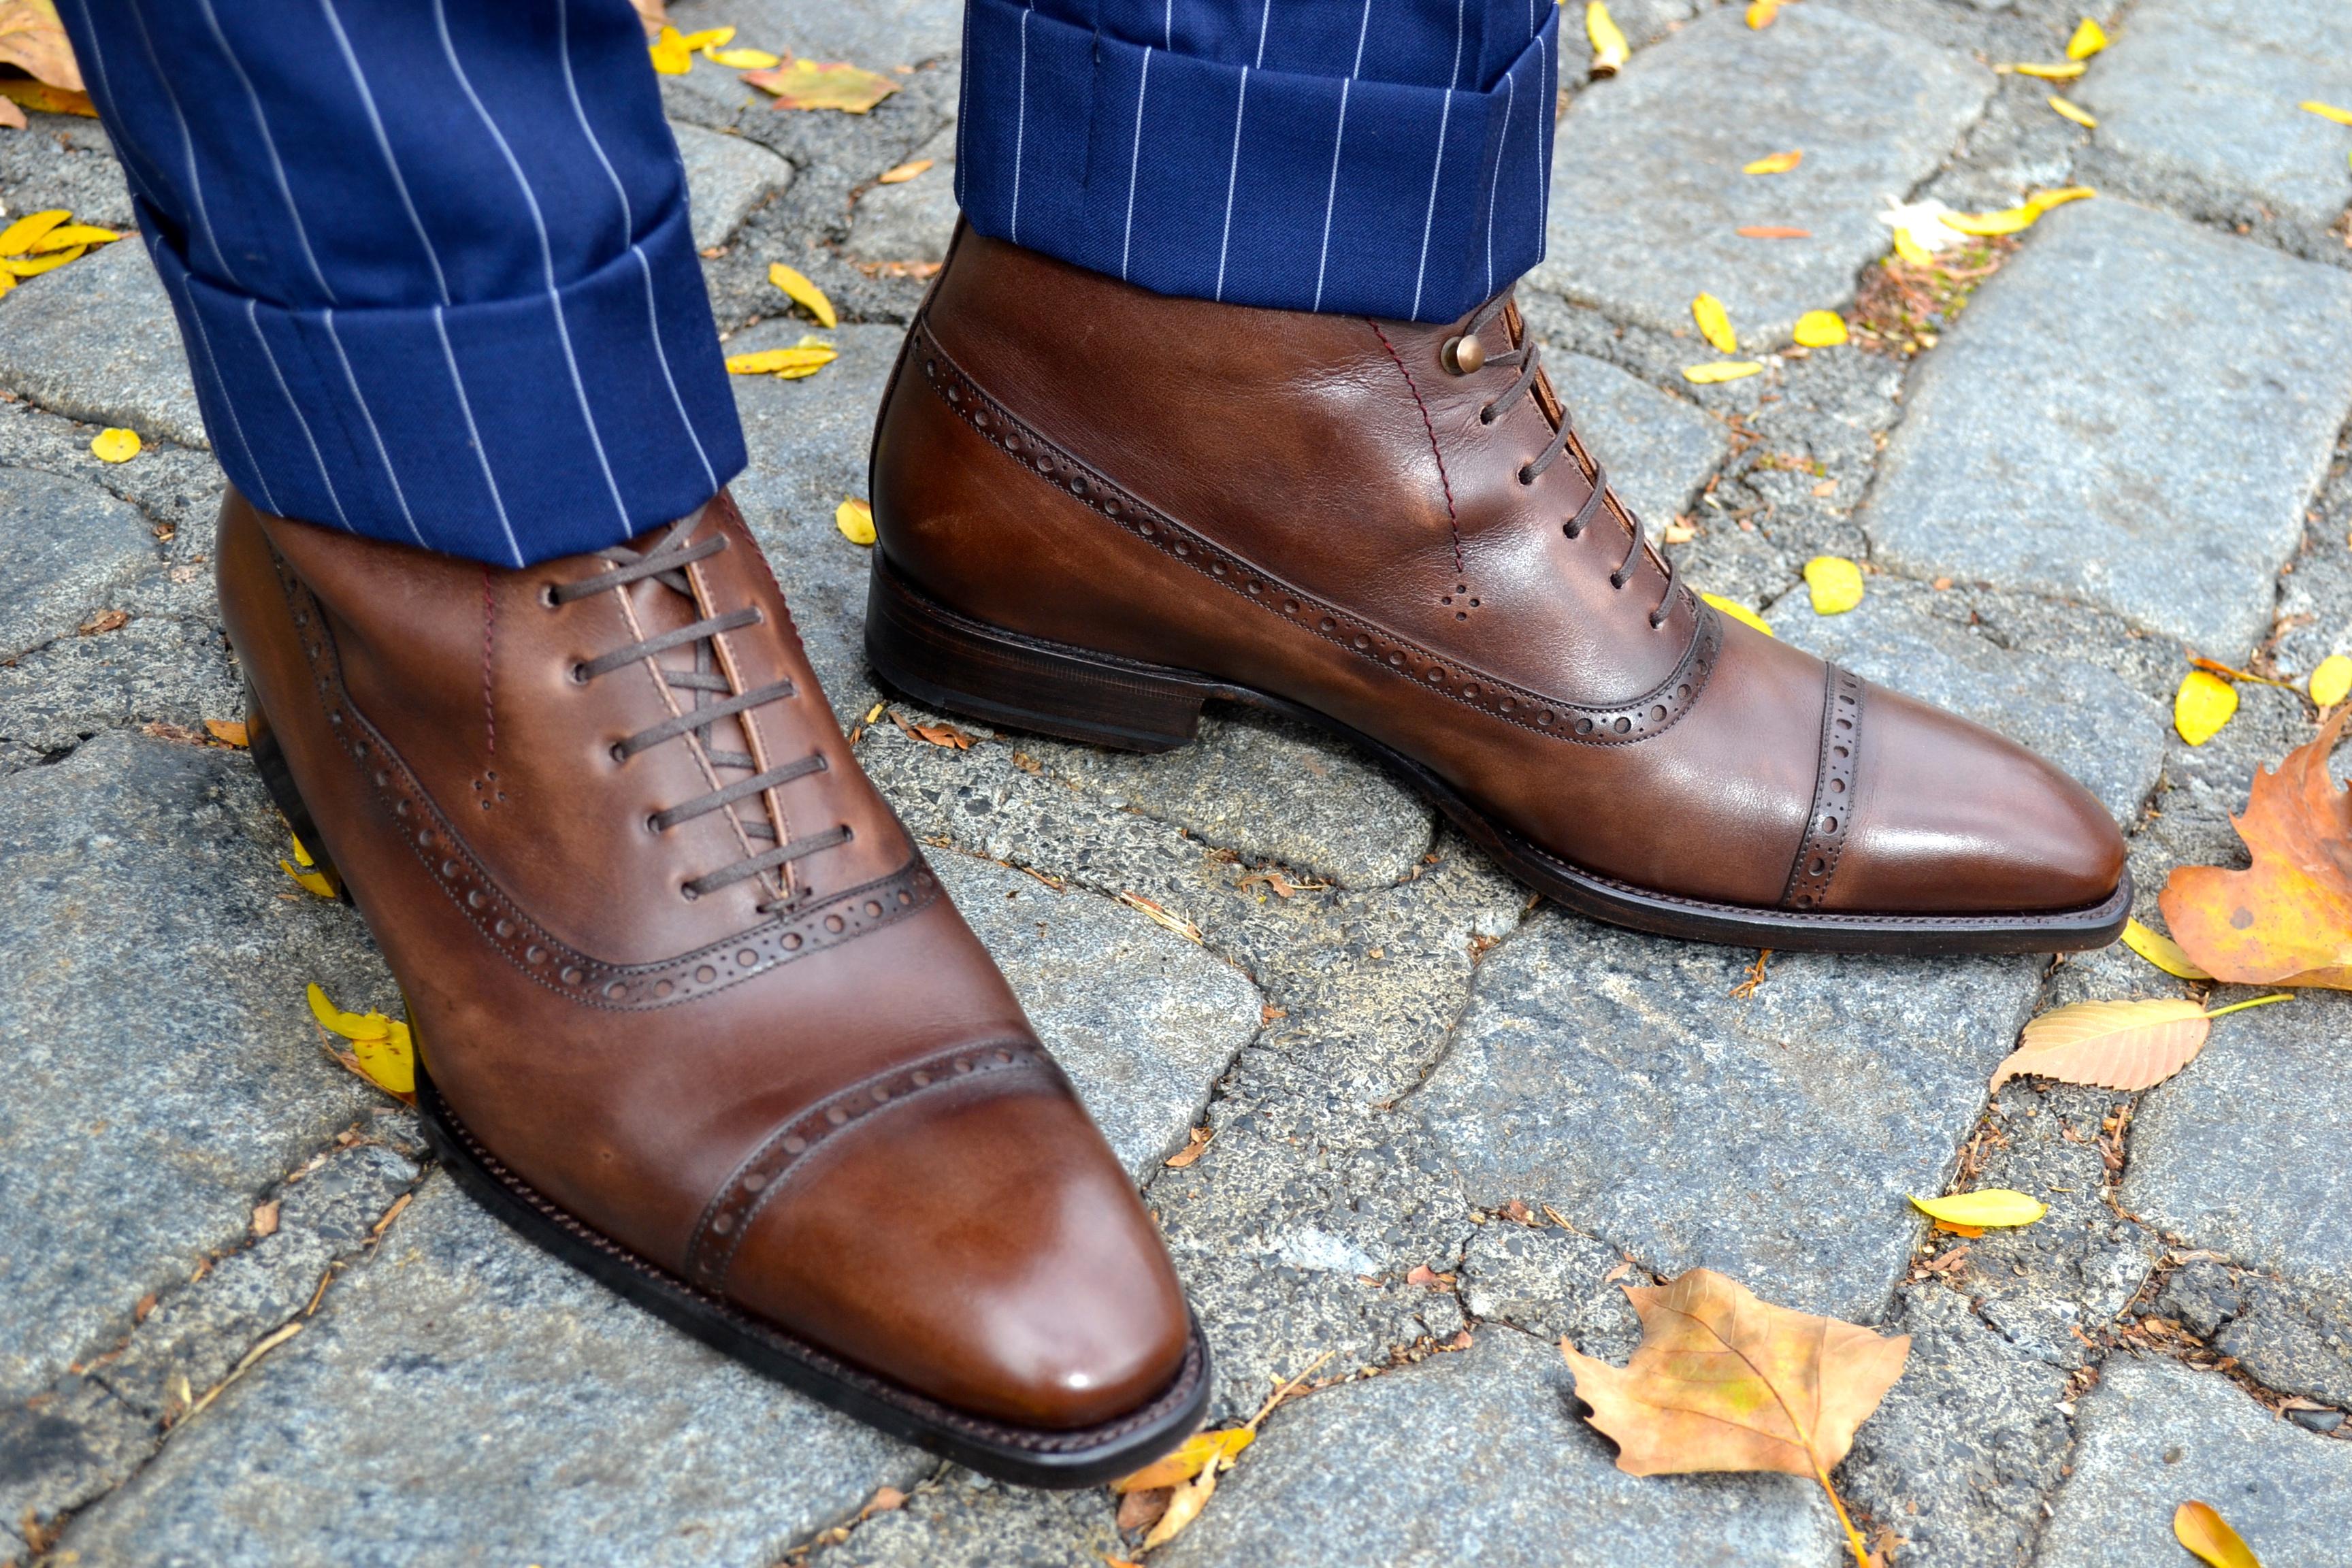 Cobbler Union Brown Leather boots